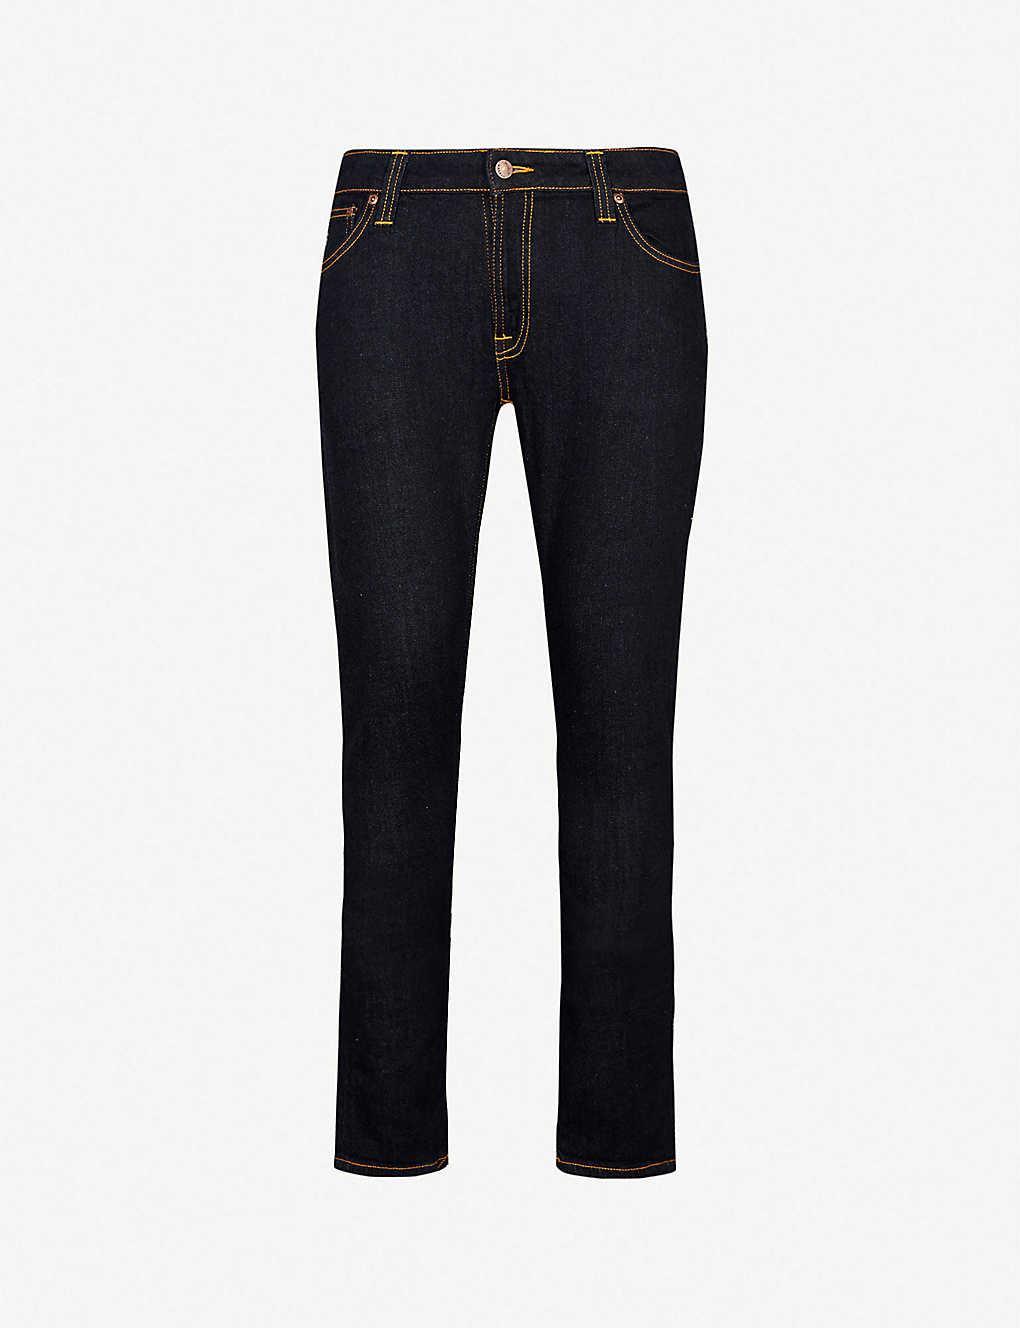 e0913bd5 NUDIE JEANS - Skinny Lin slim-fit skinny jeans | Selfridges.com